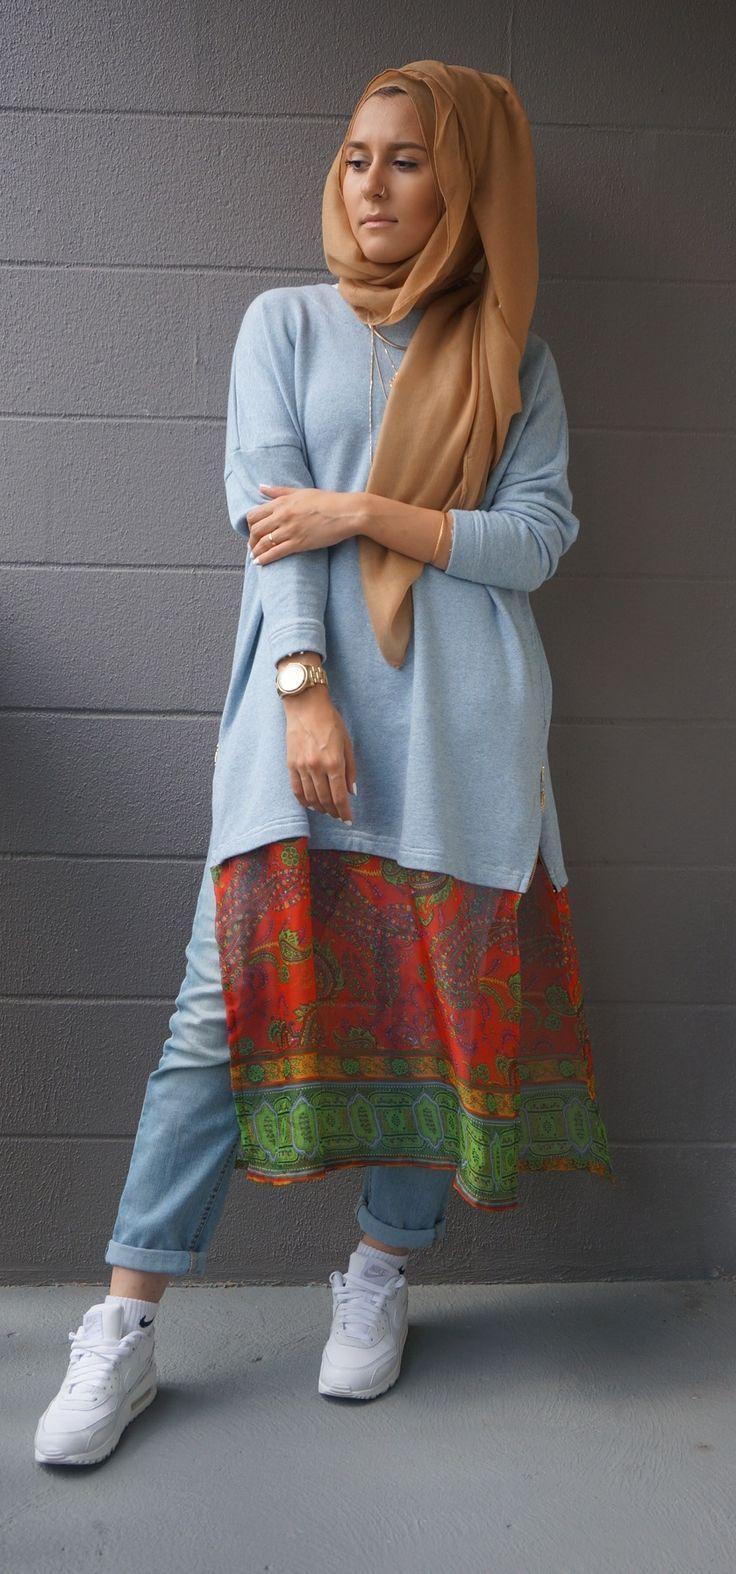 Impressive collection of dina tokio hijab fashion  ideas for modern women (20)